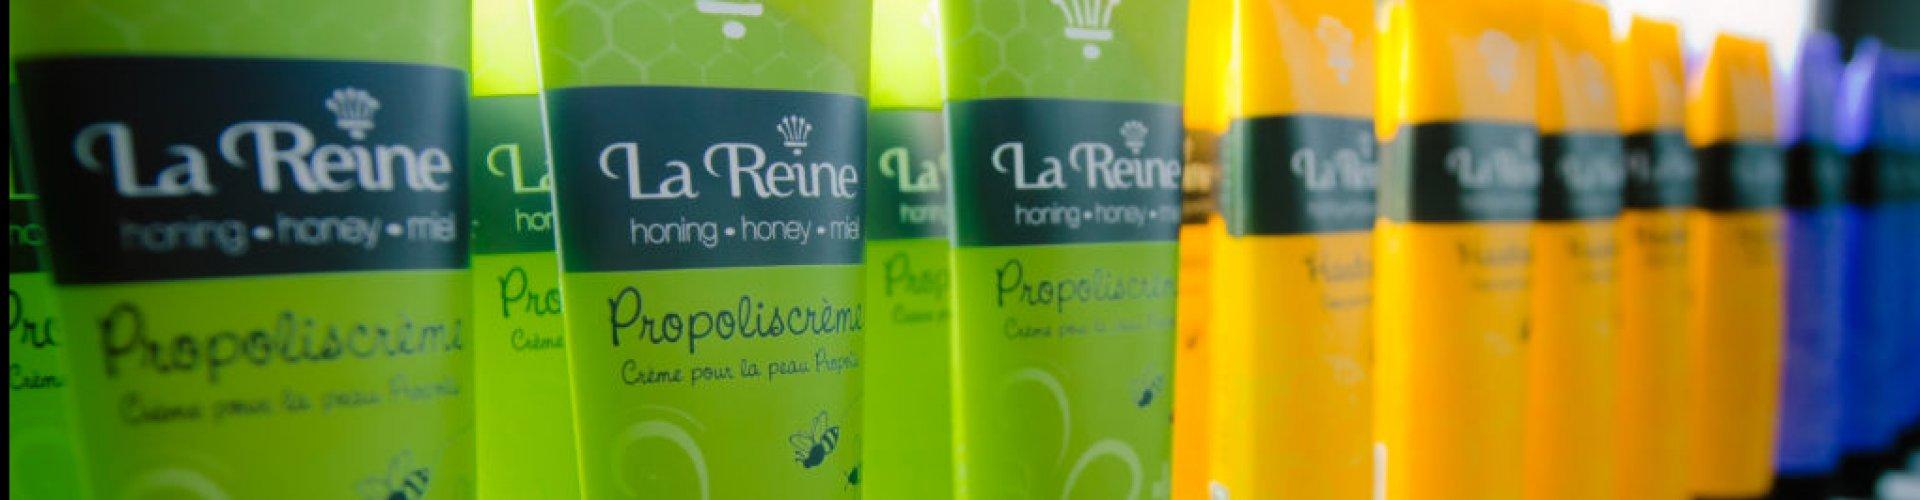 Verkooppunt La Reine Honing Crèmes